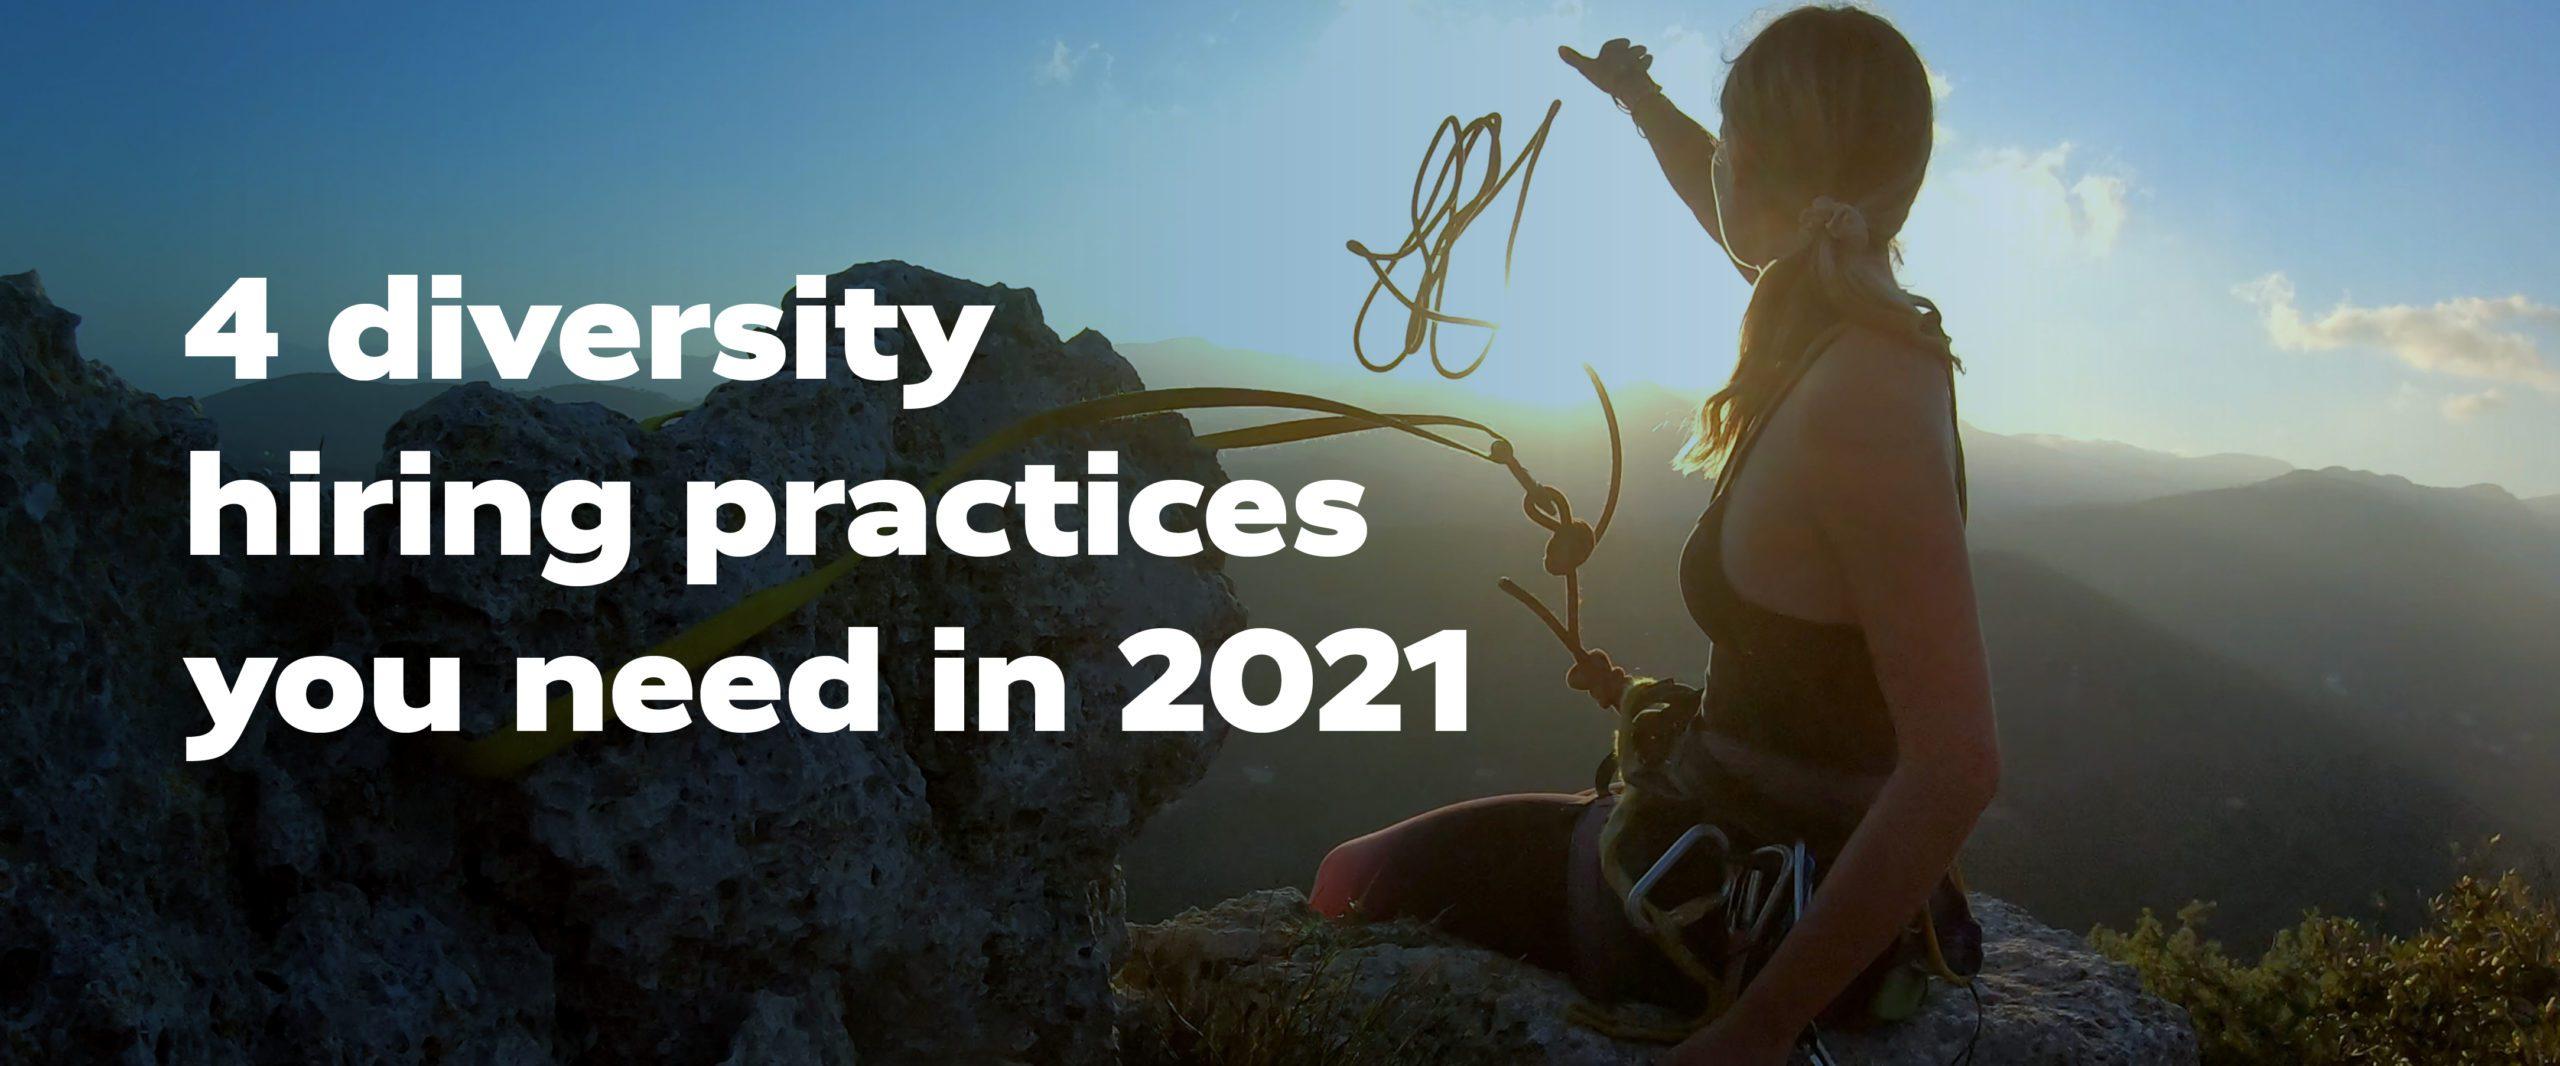 diversity hiring practices